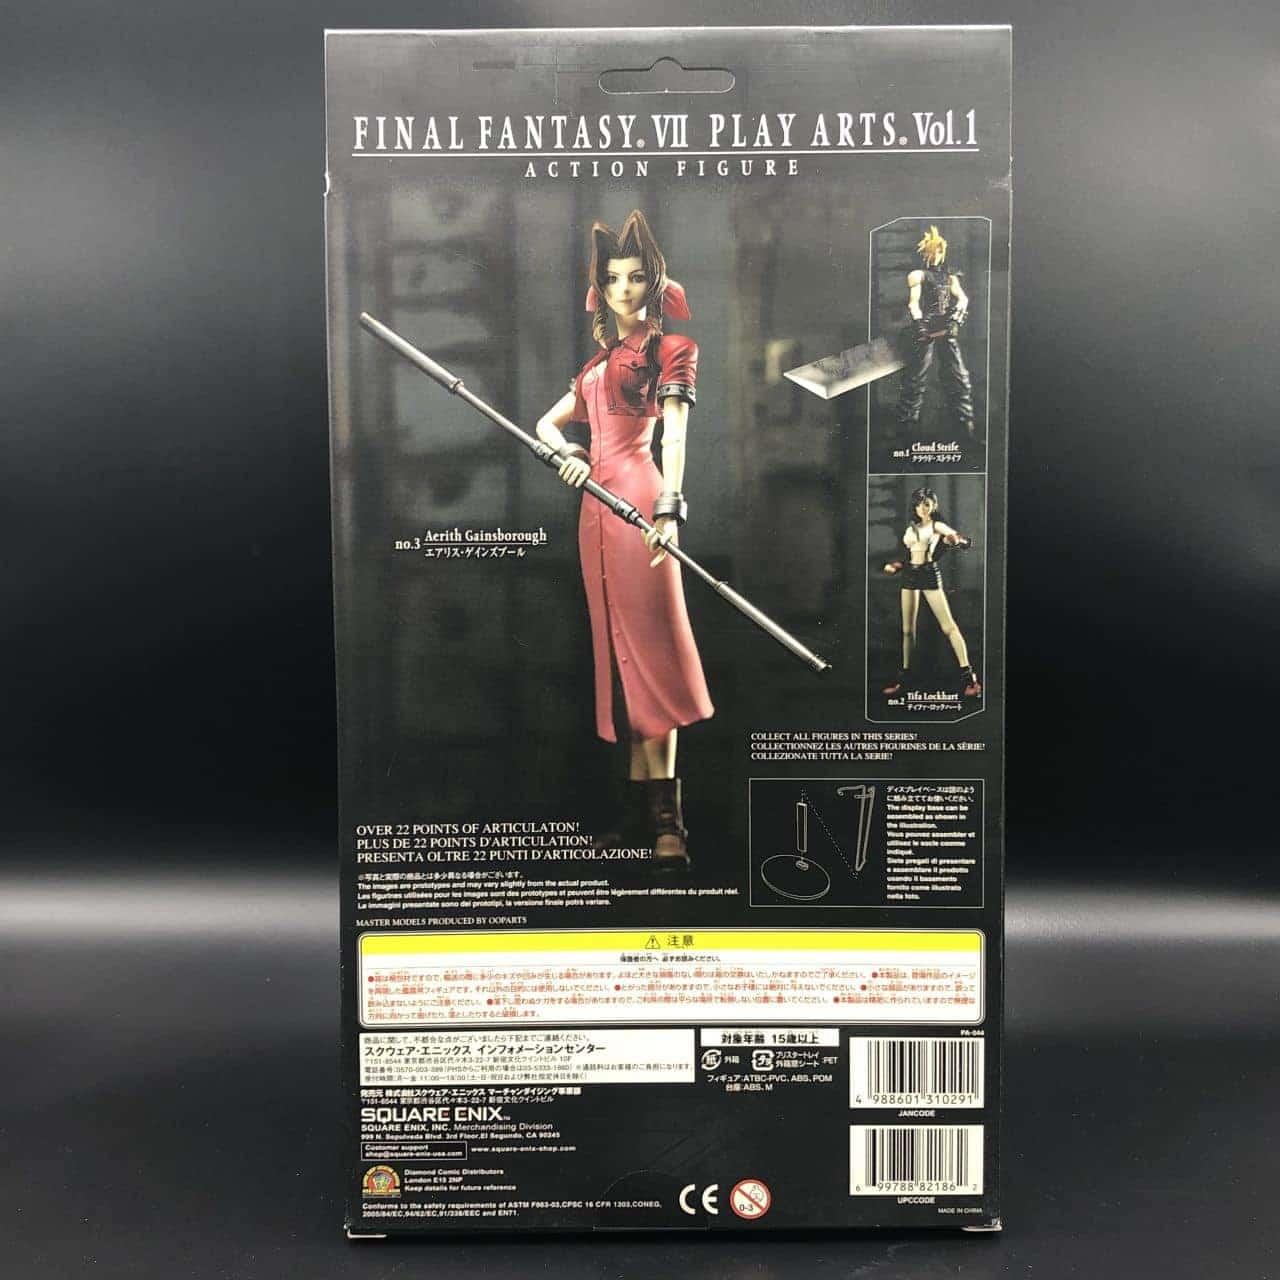 Final Fantasy VII Play Arts. Vol. 1 Action Figure: Aerith Gainsborough (Gut)